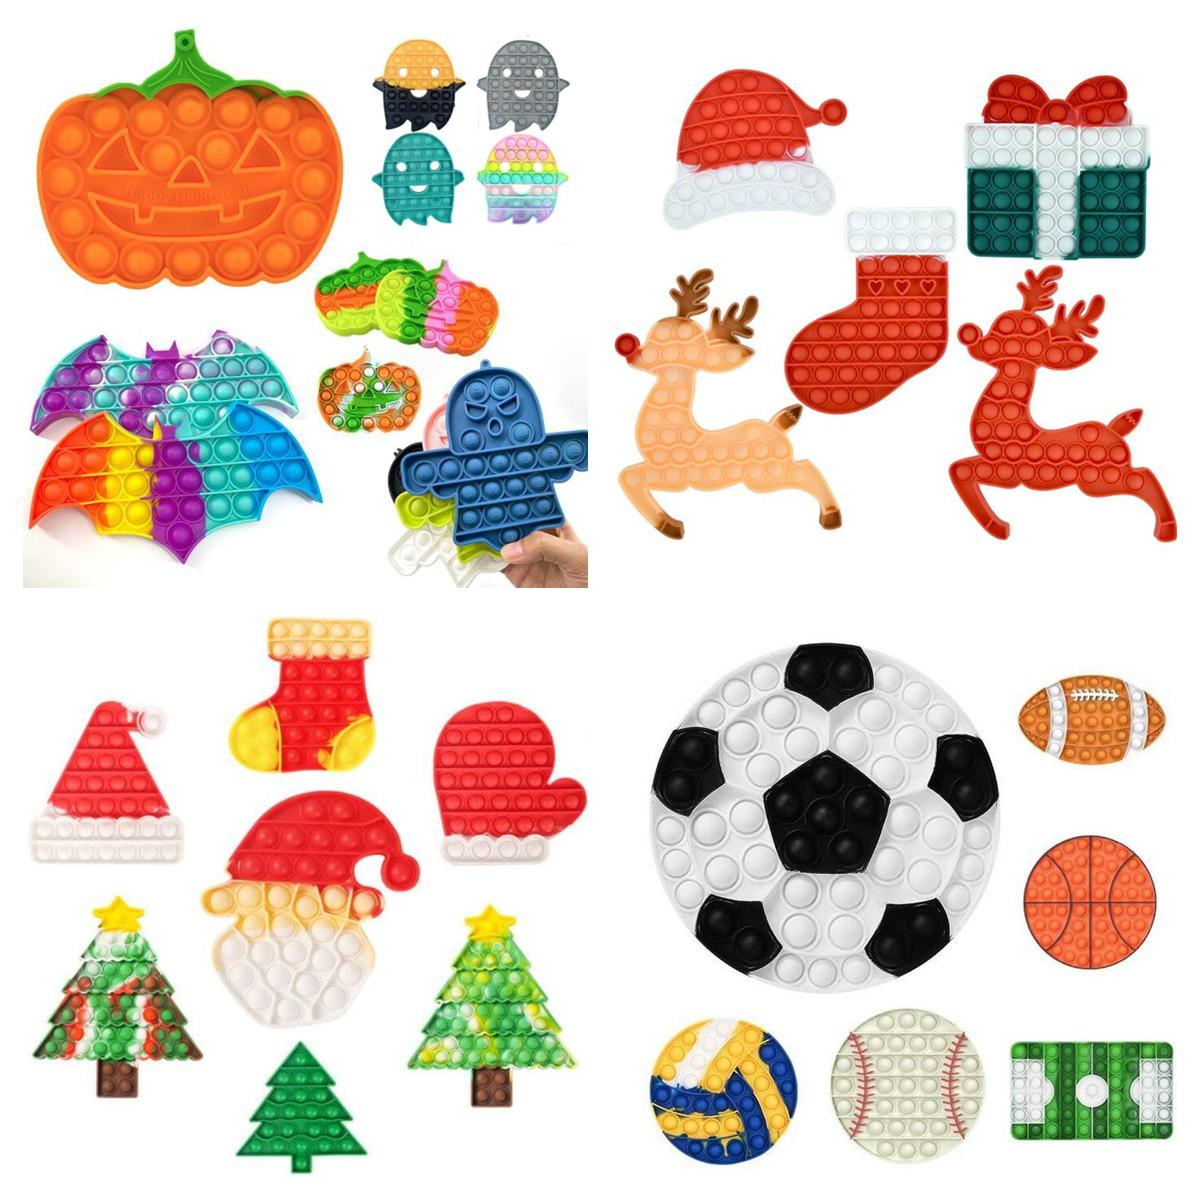 Halloween Pumpkin Push Fidget Jouets Cadeau De Christmas Boîte Cadeau Sensory Bulle Doigt Toy Fism Spécial Besoins anxiété Stress Stress Relever 2022 DHL